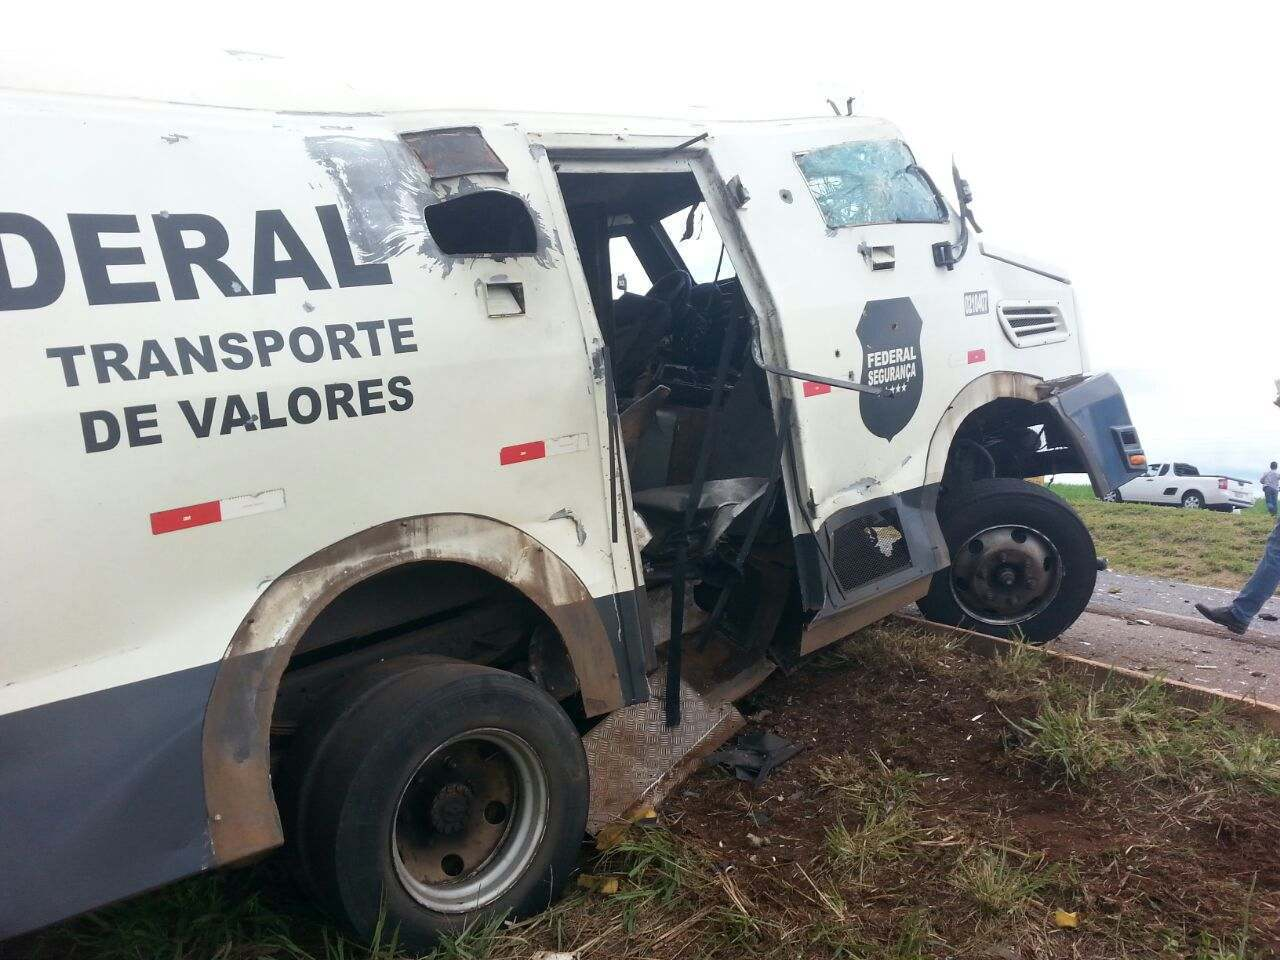 Carro forte explosao Federal Seguranca